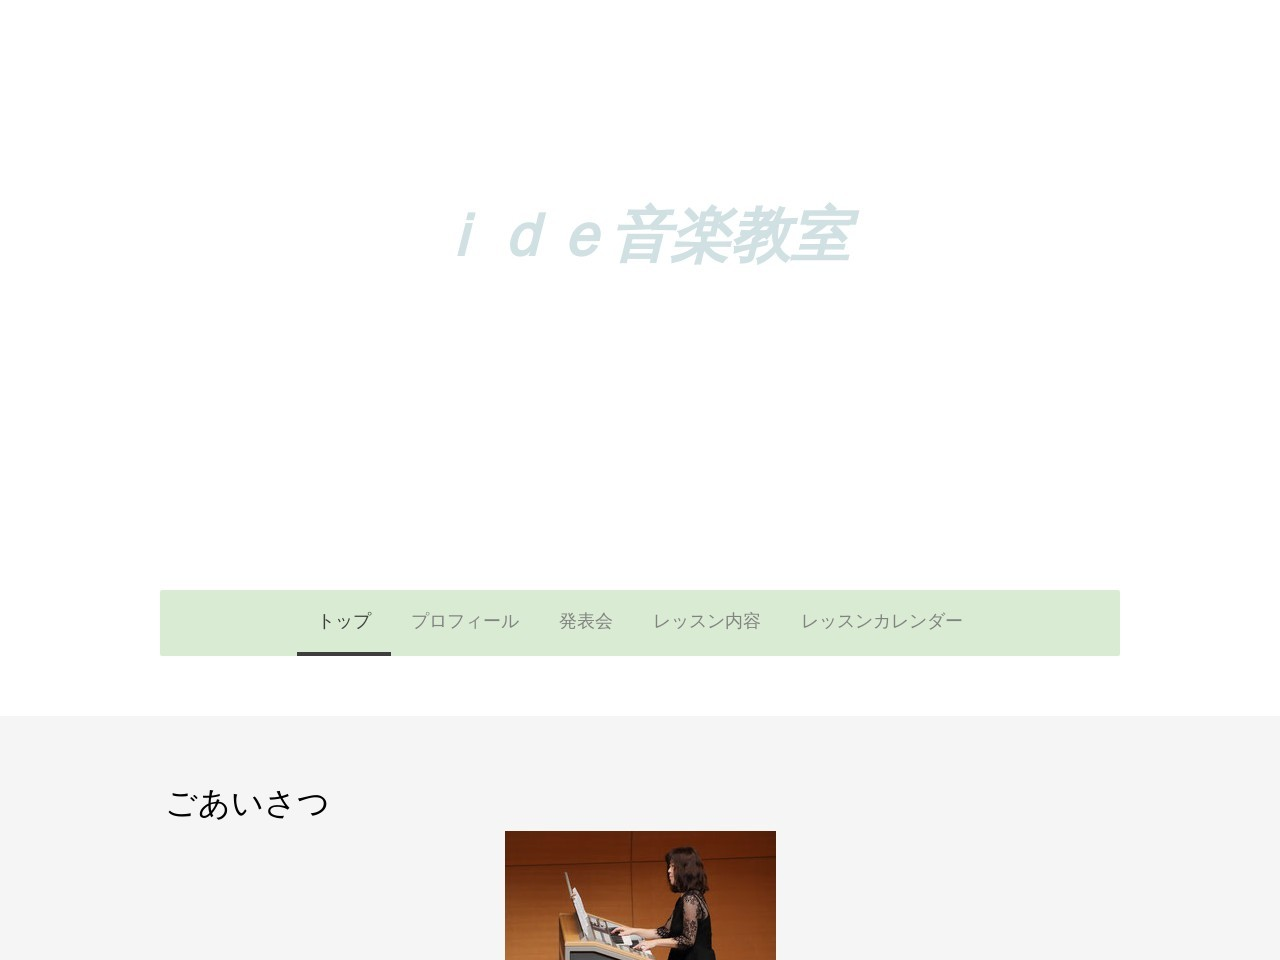 ide音楽教室のサムネイル